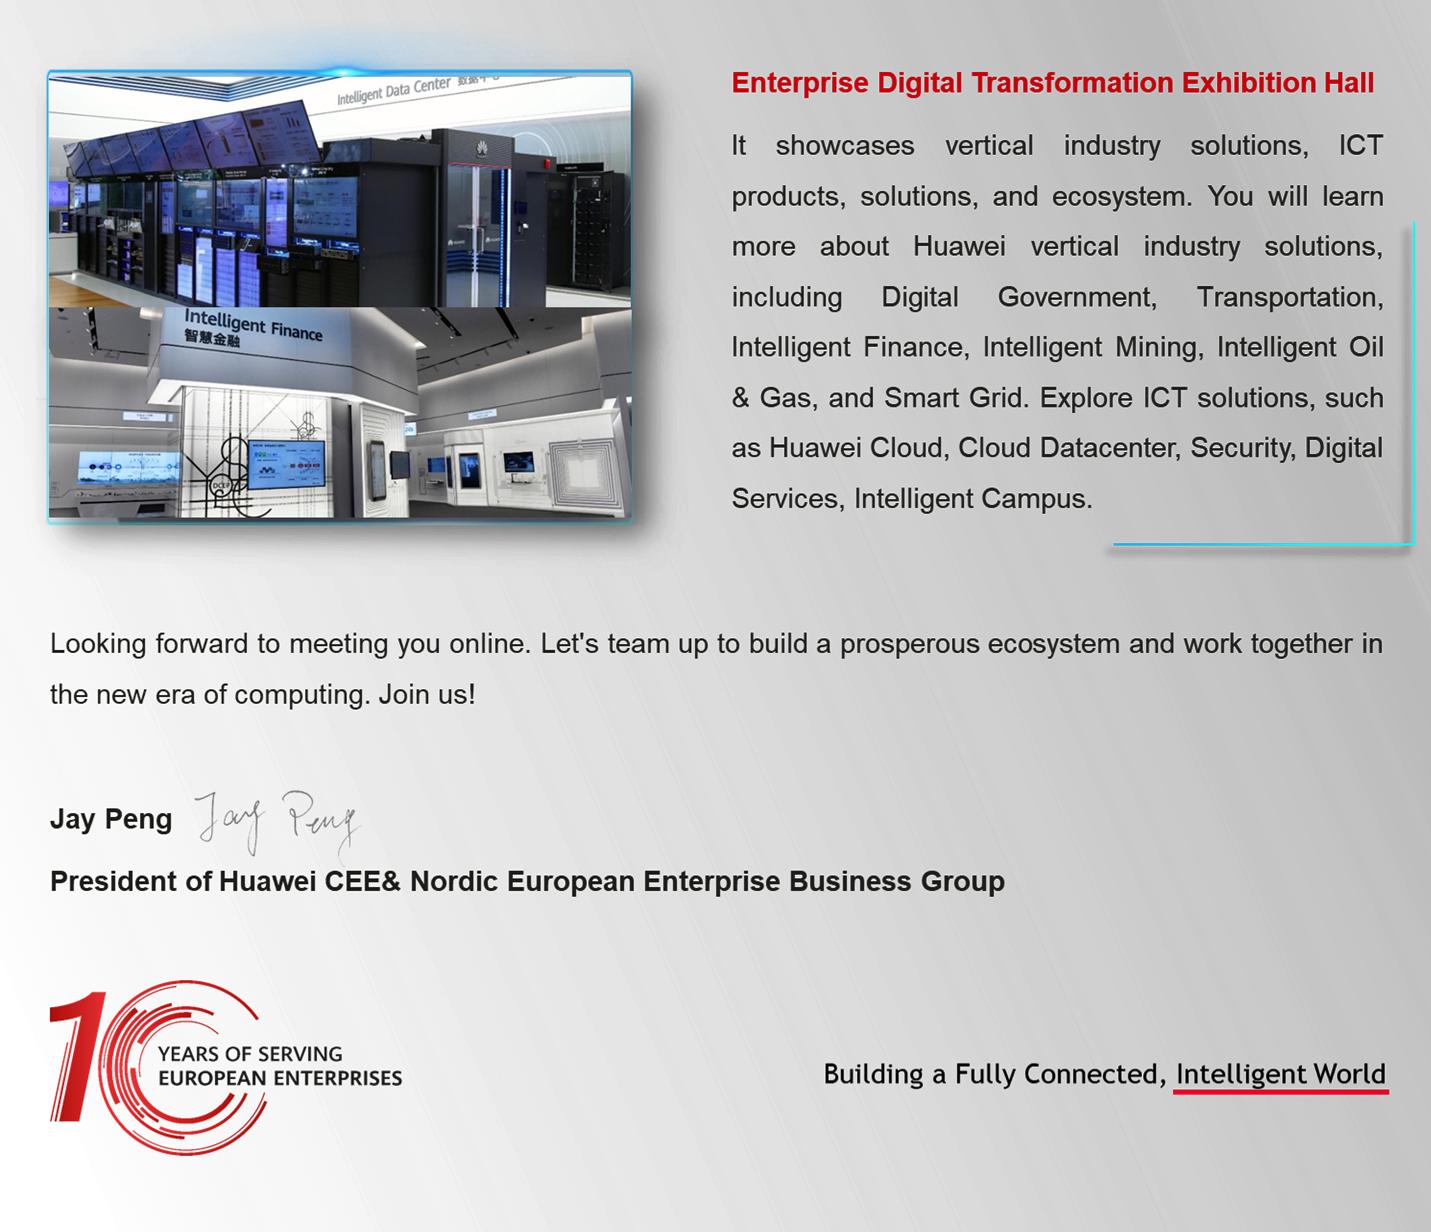 Huawei Exhibition Hall